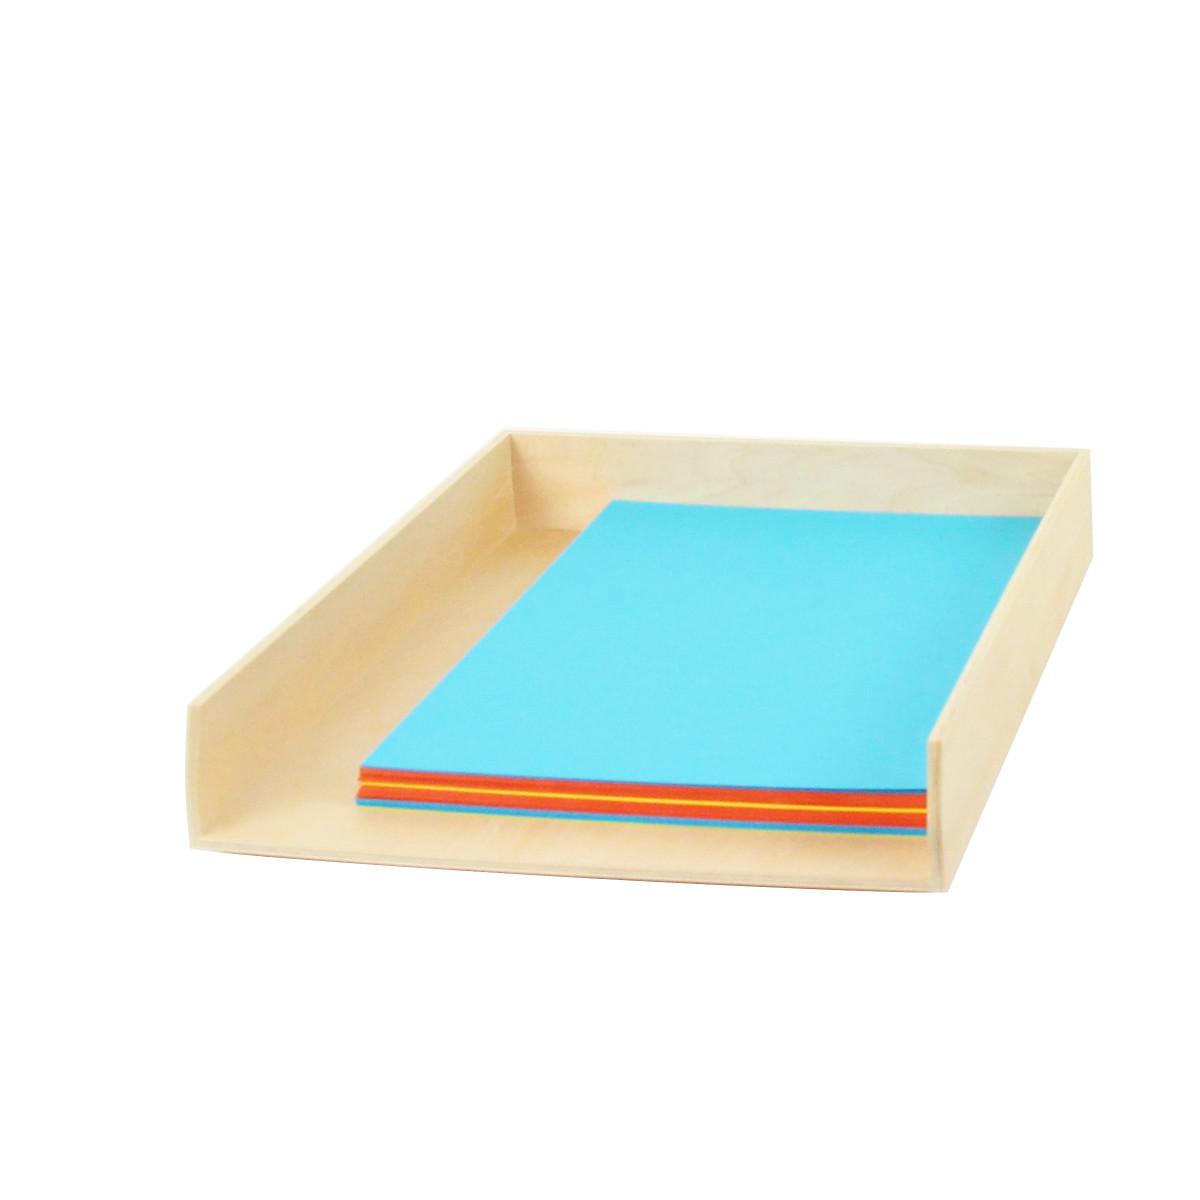 bannette courrier bois naturel format a4 rangement bureau. Black Bedroom Furniture Sets. Home Design Ideas